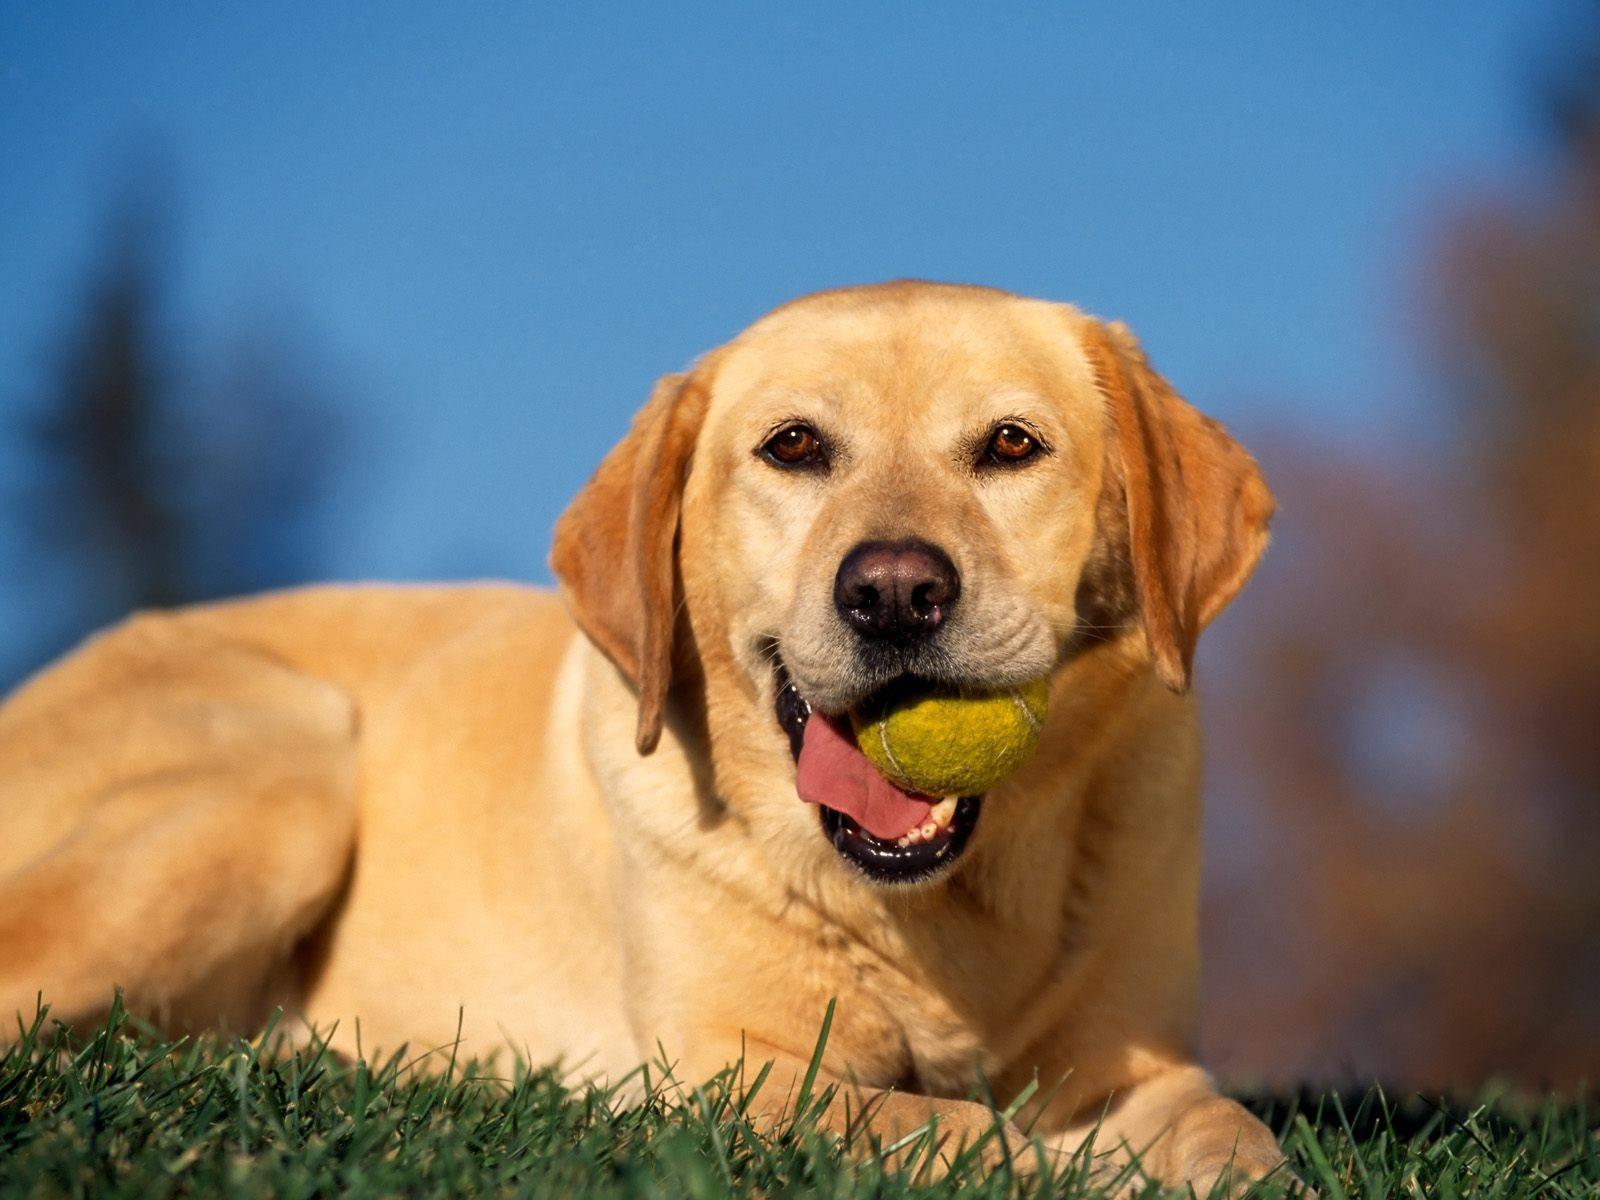 Cute Labrador Puppies Wallpapers Break Time Yellow Labrador Wallpapers Hd Wallpapers